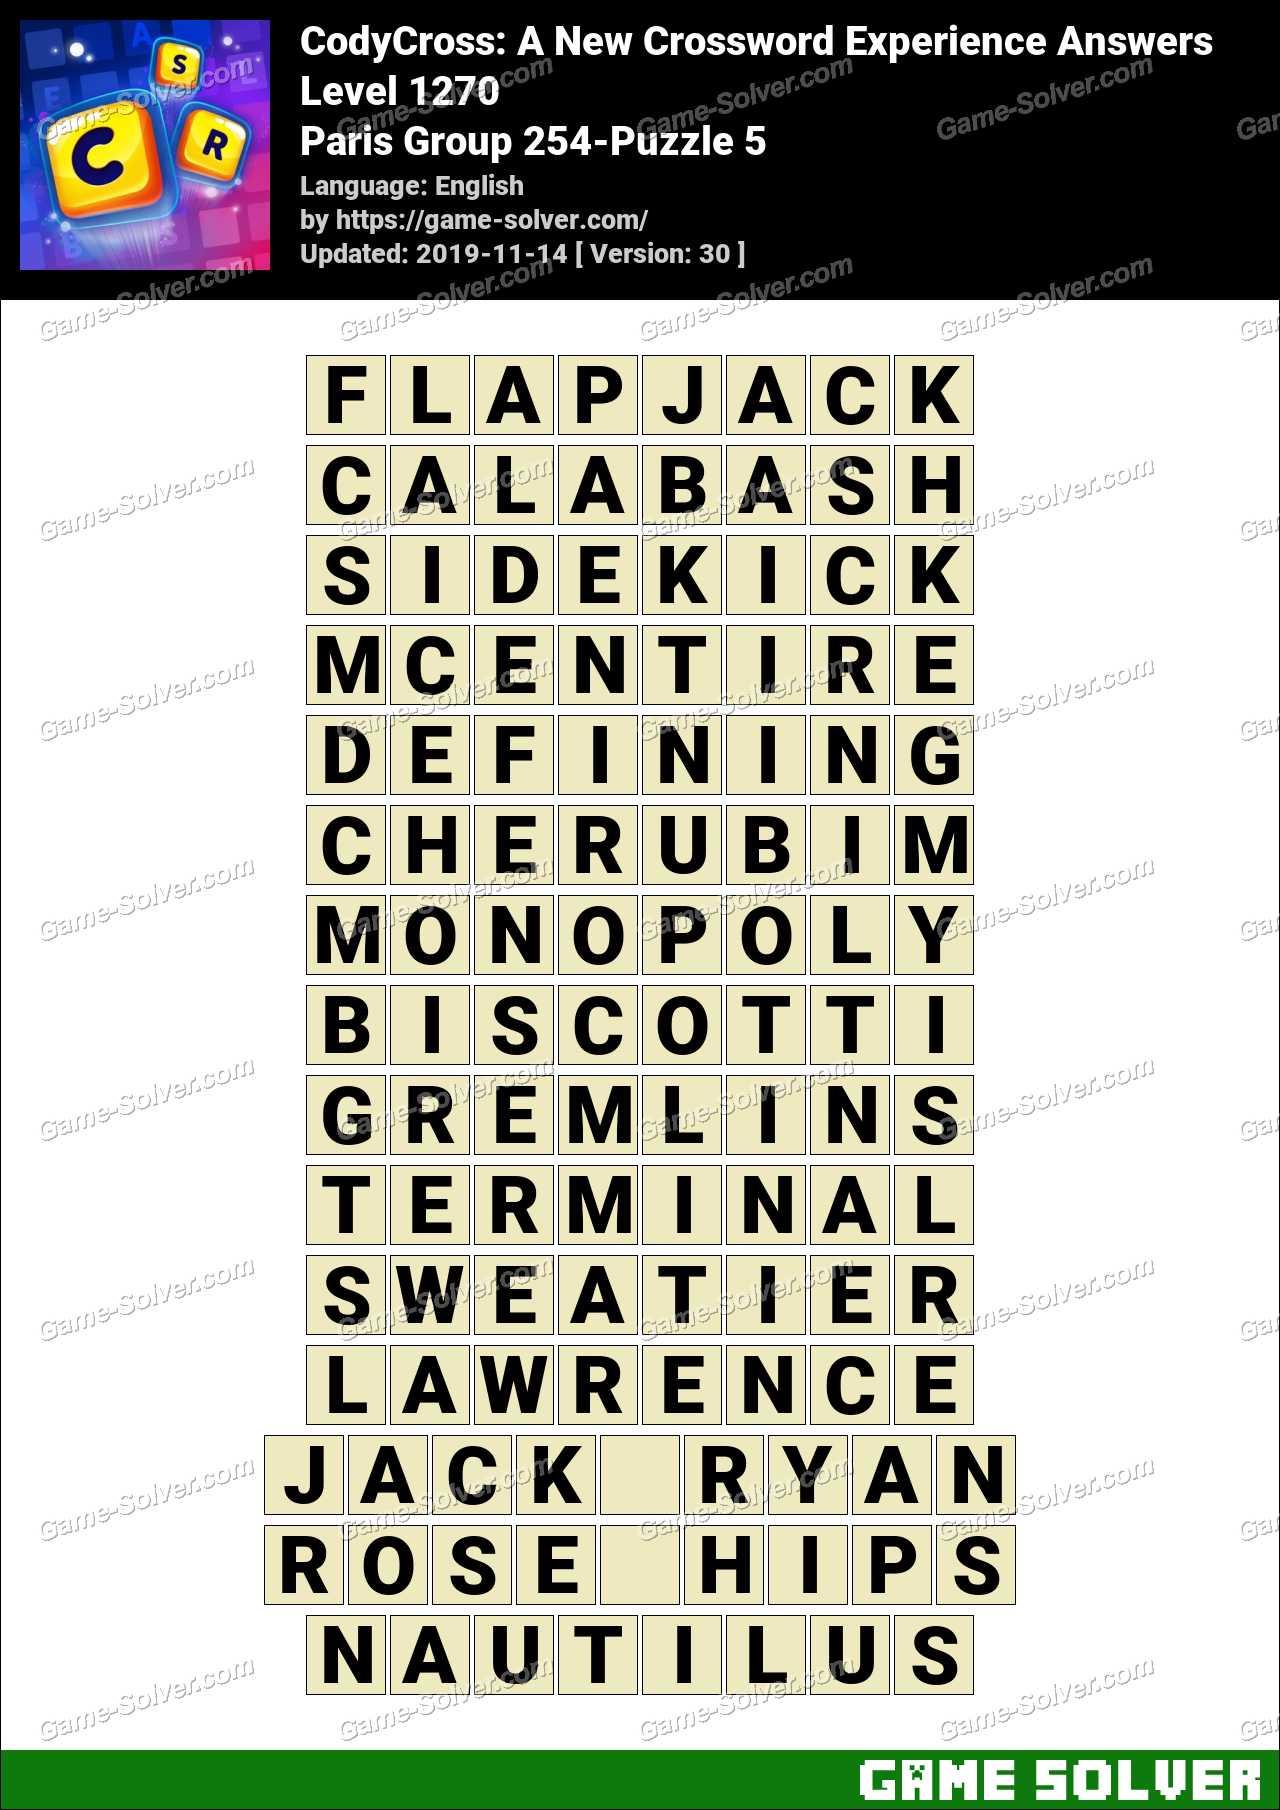 CodyCross Paris Group 254-Puzzle 5 Answers